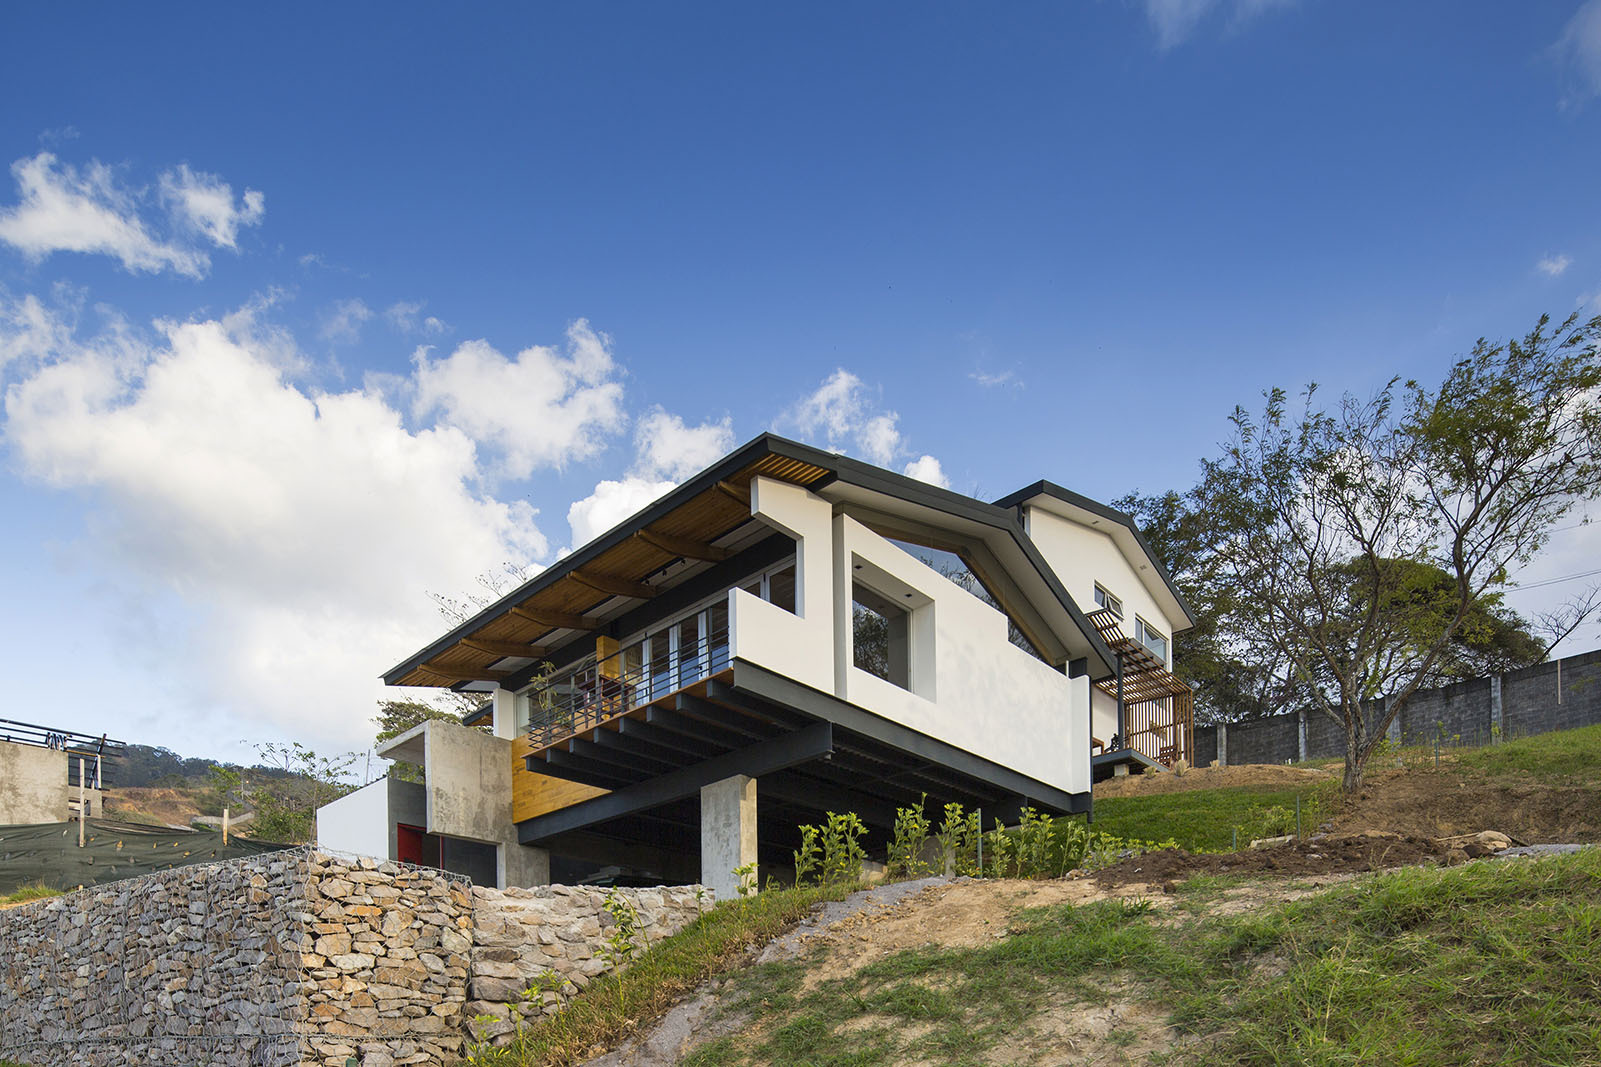 Casa en ladera aarcano arquitectura plataforma for Arquitectura casa